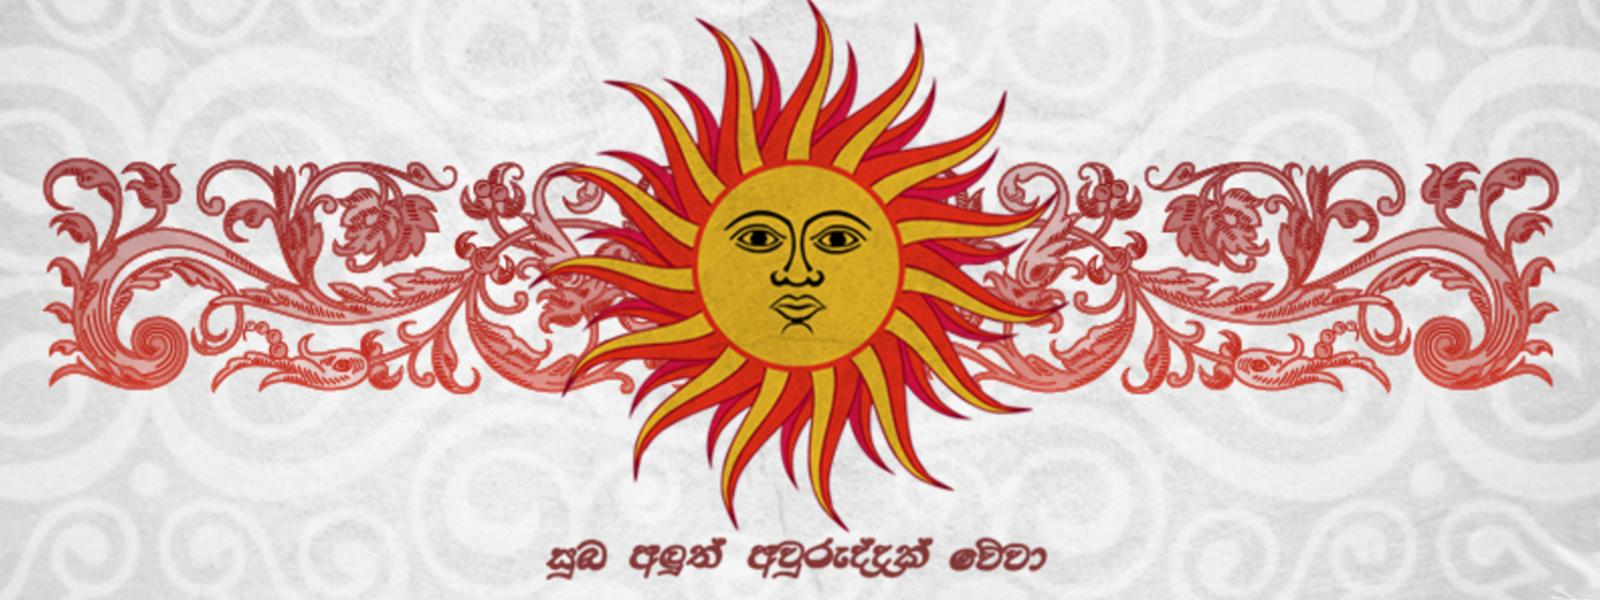 Sri Lanka welcomes Sinhala & Tamil New Year